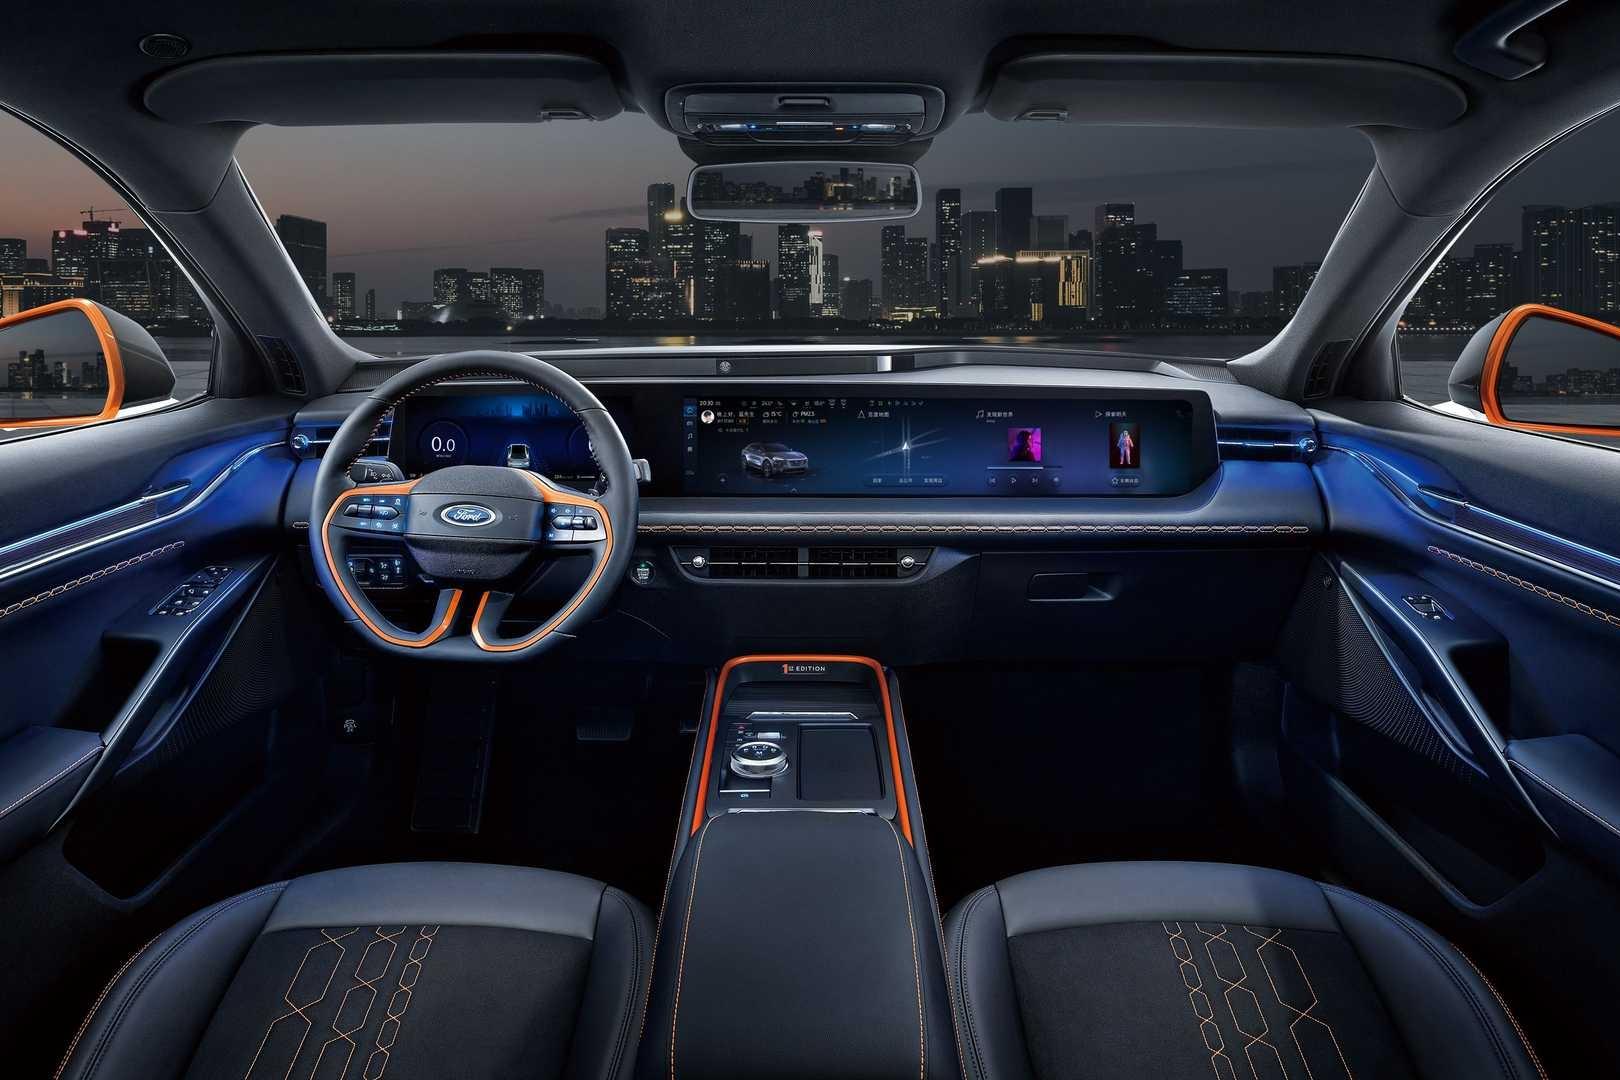 2021-ford-evos-cn (1)